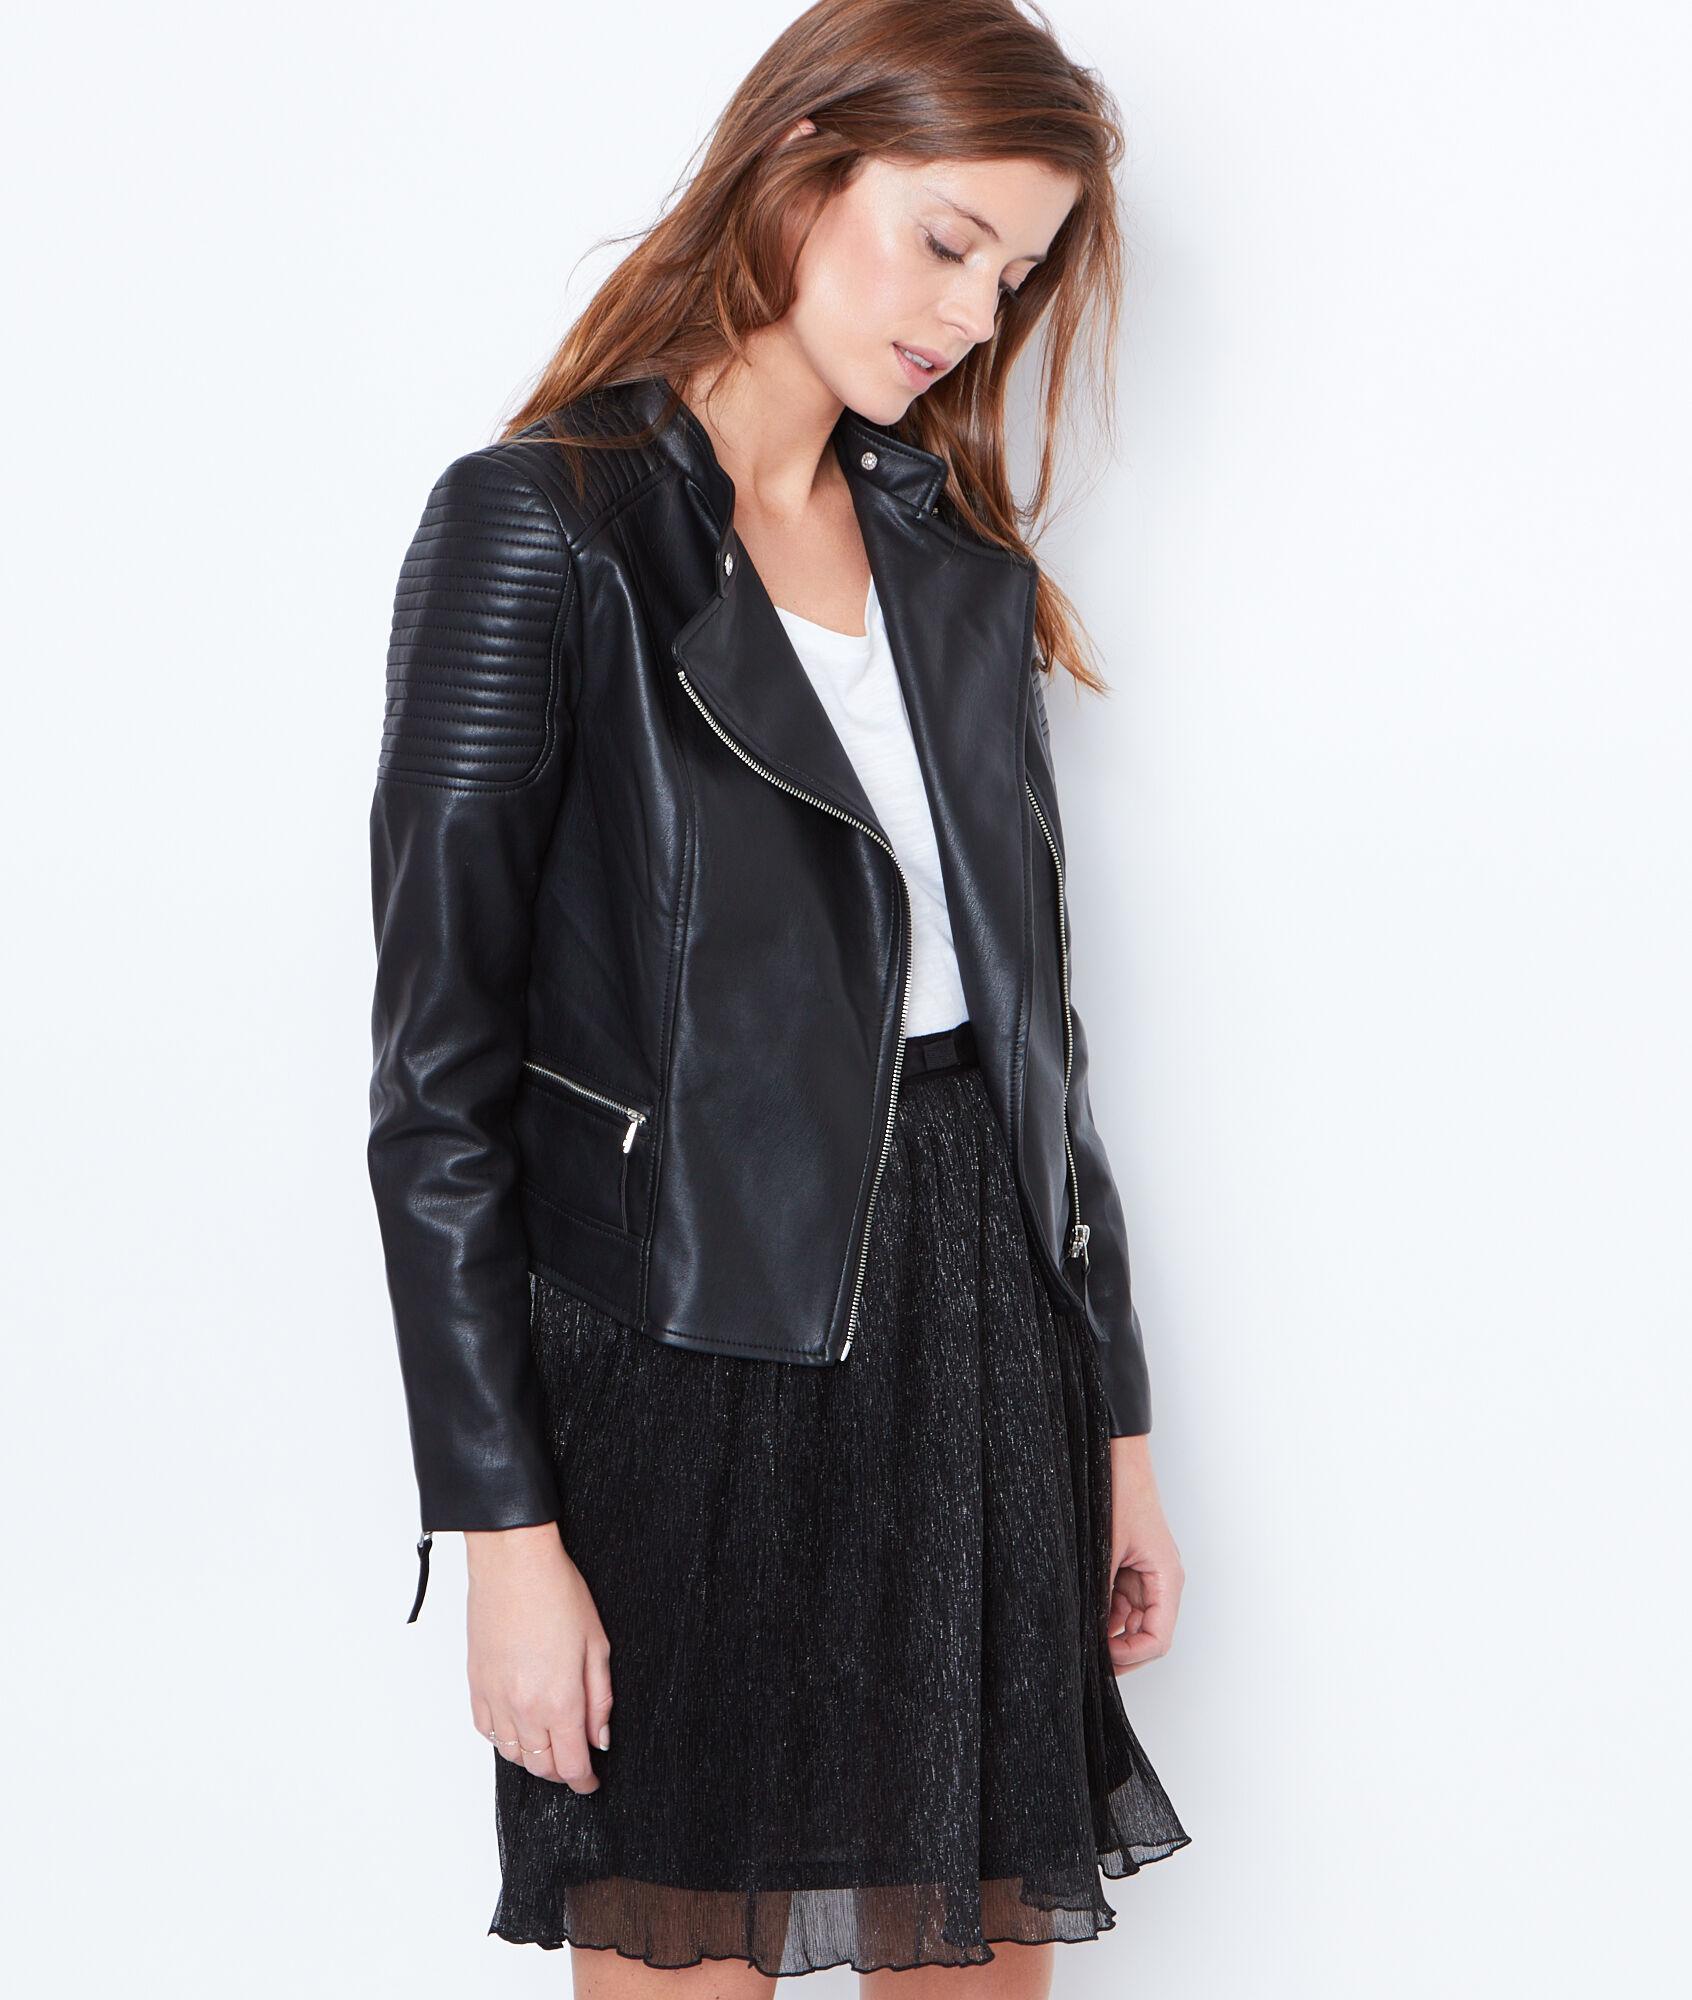 Veste en cuir femme style rock